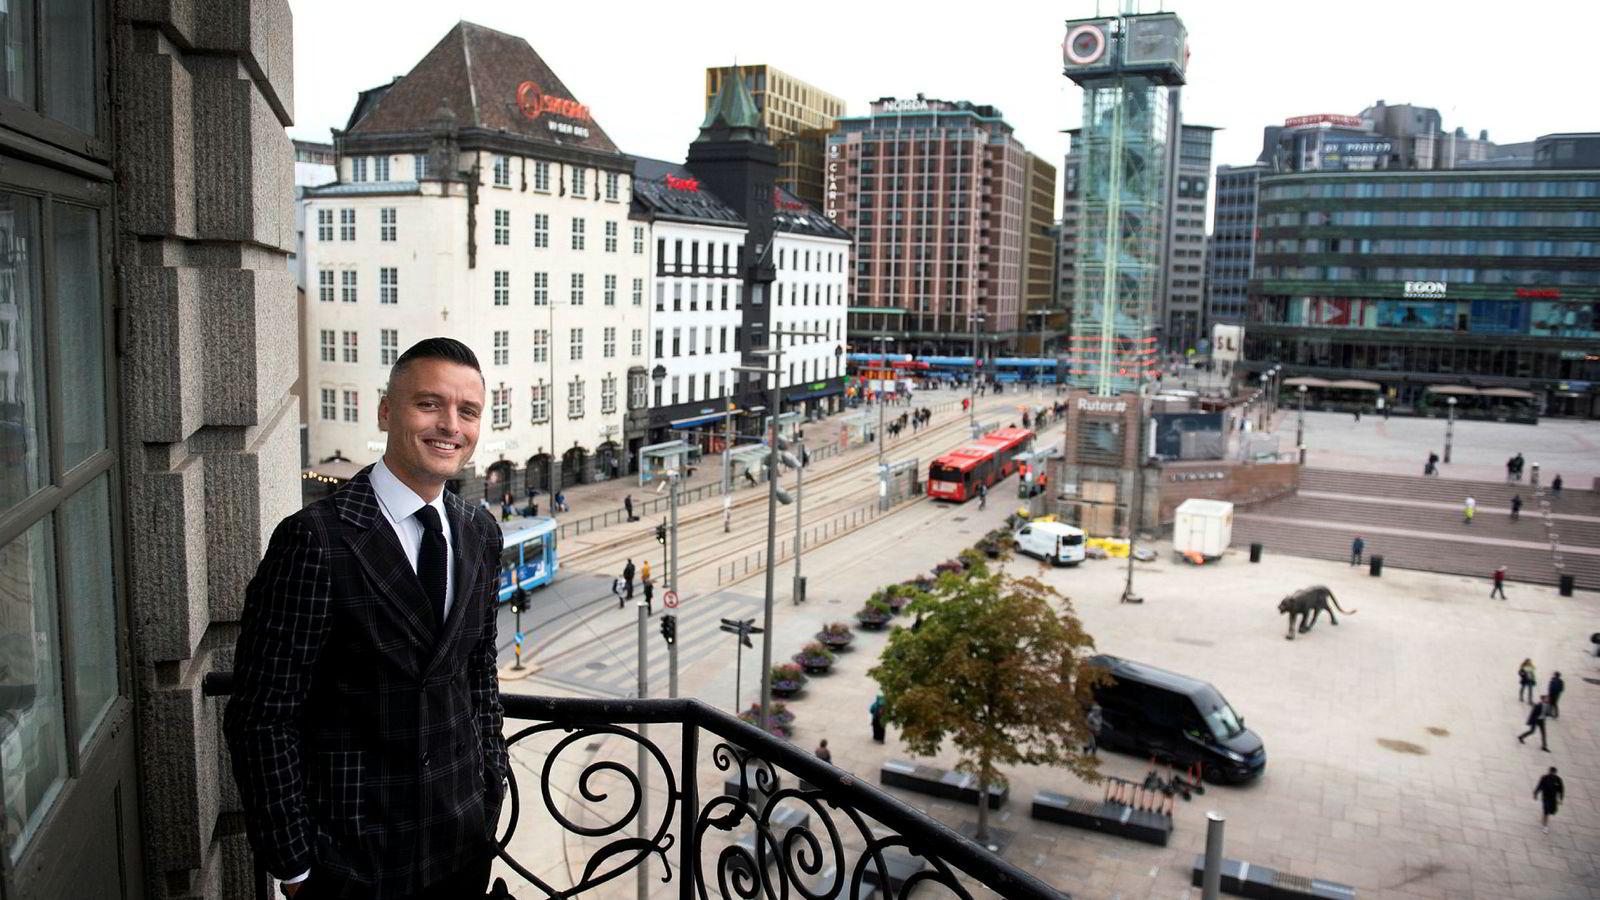 Hotelldirektør Wilhelm Hartwig på Petter A. Stordalens nye boutique-hotell Amerikalinjen midt i Oslo sentrum har hatt en langt bedre start enn ventet.